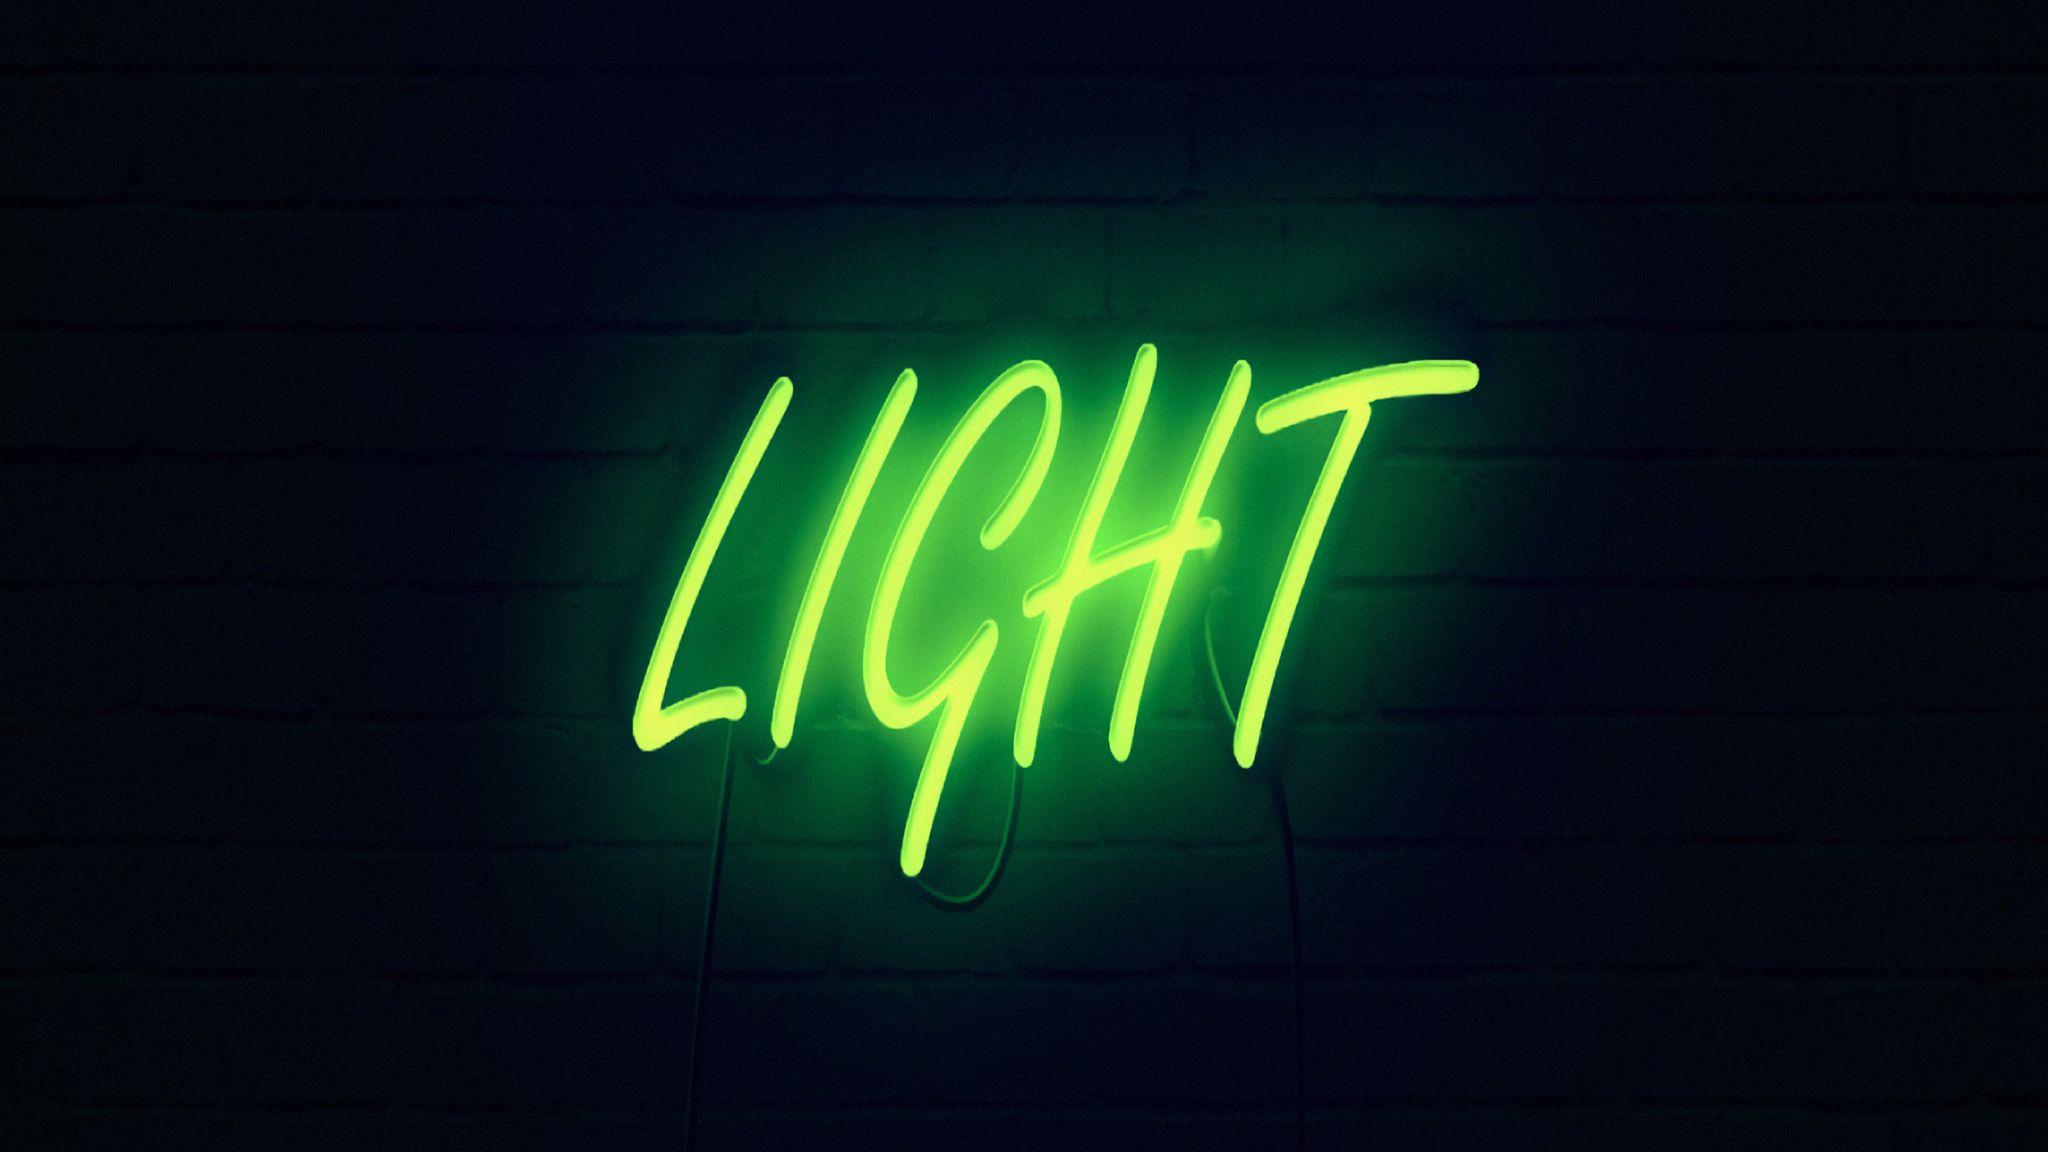 2048x1152 Wallpaper light, neon, inscription, dark, yellow